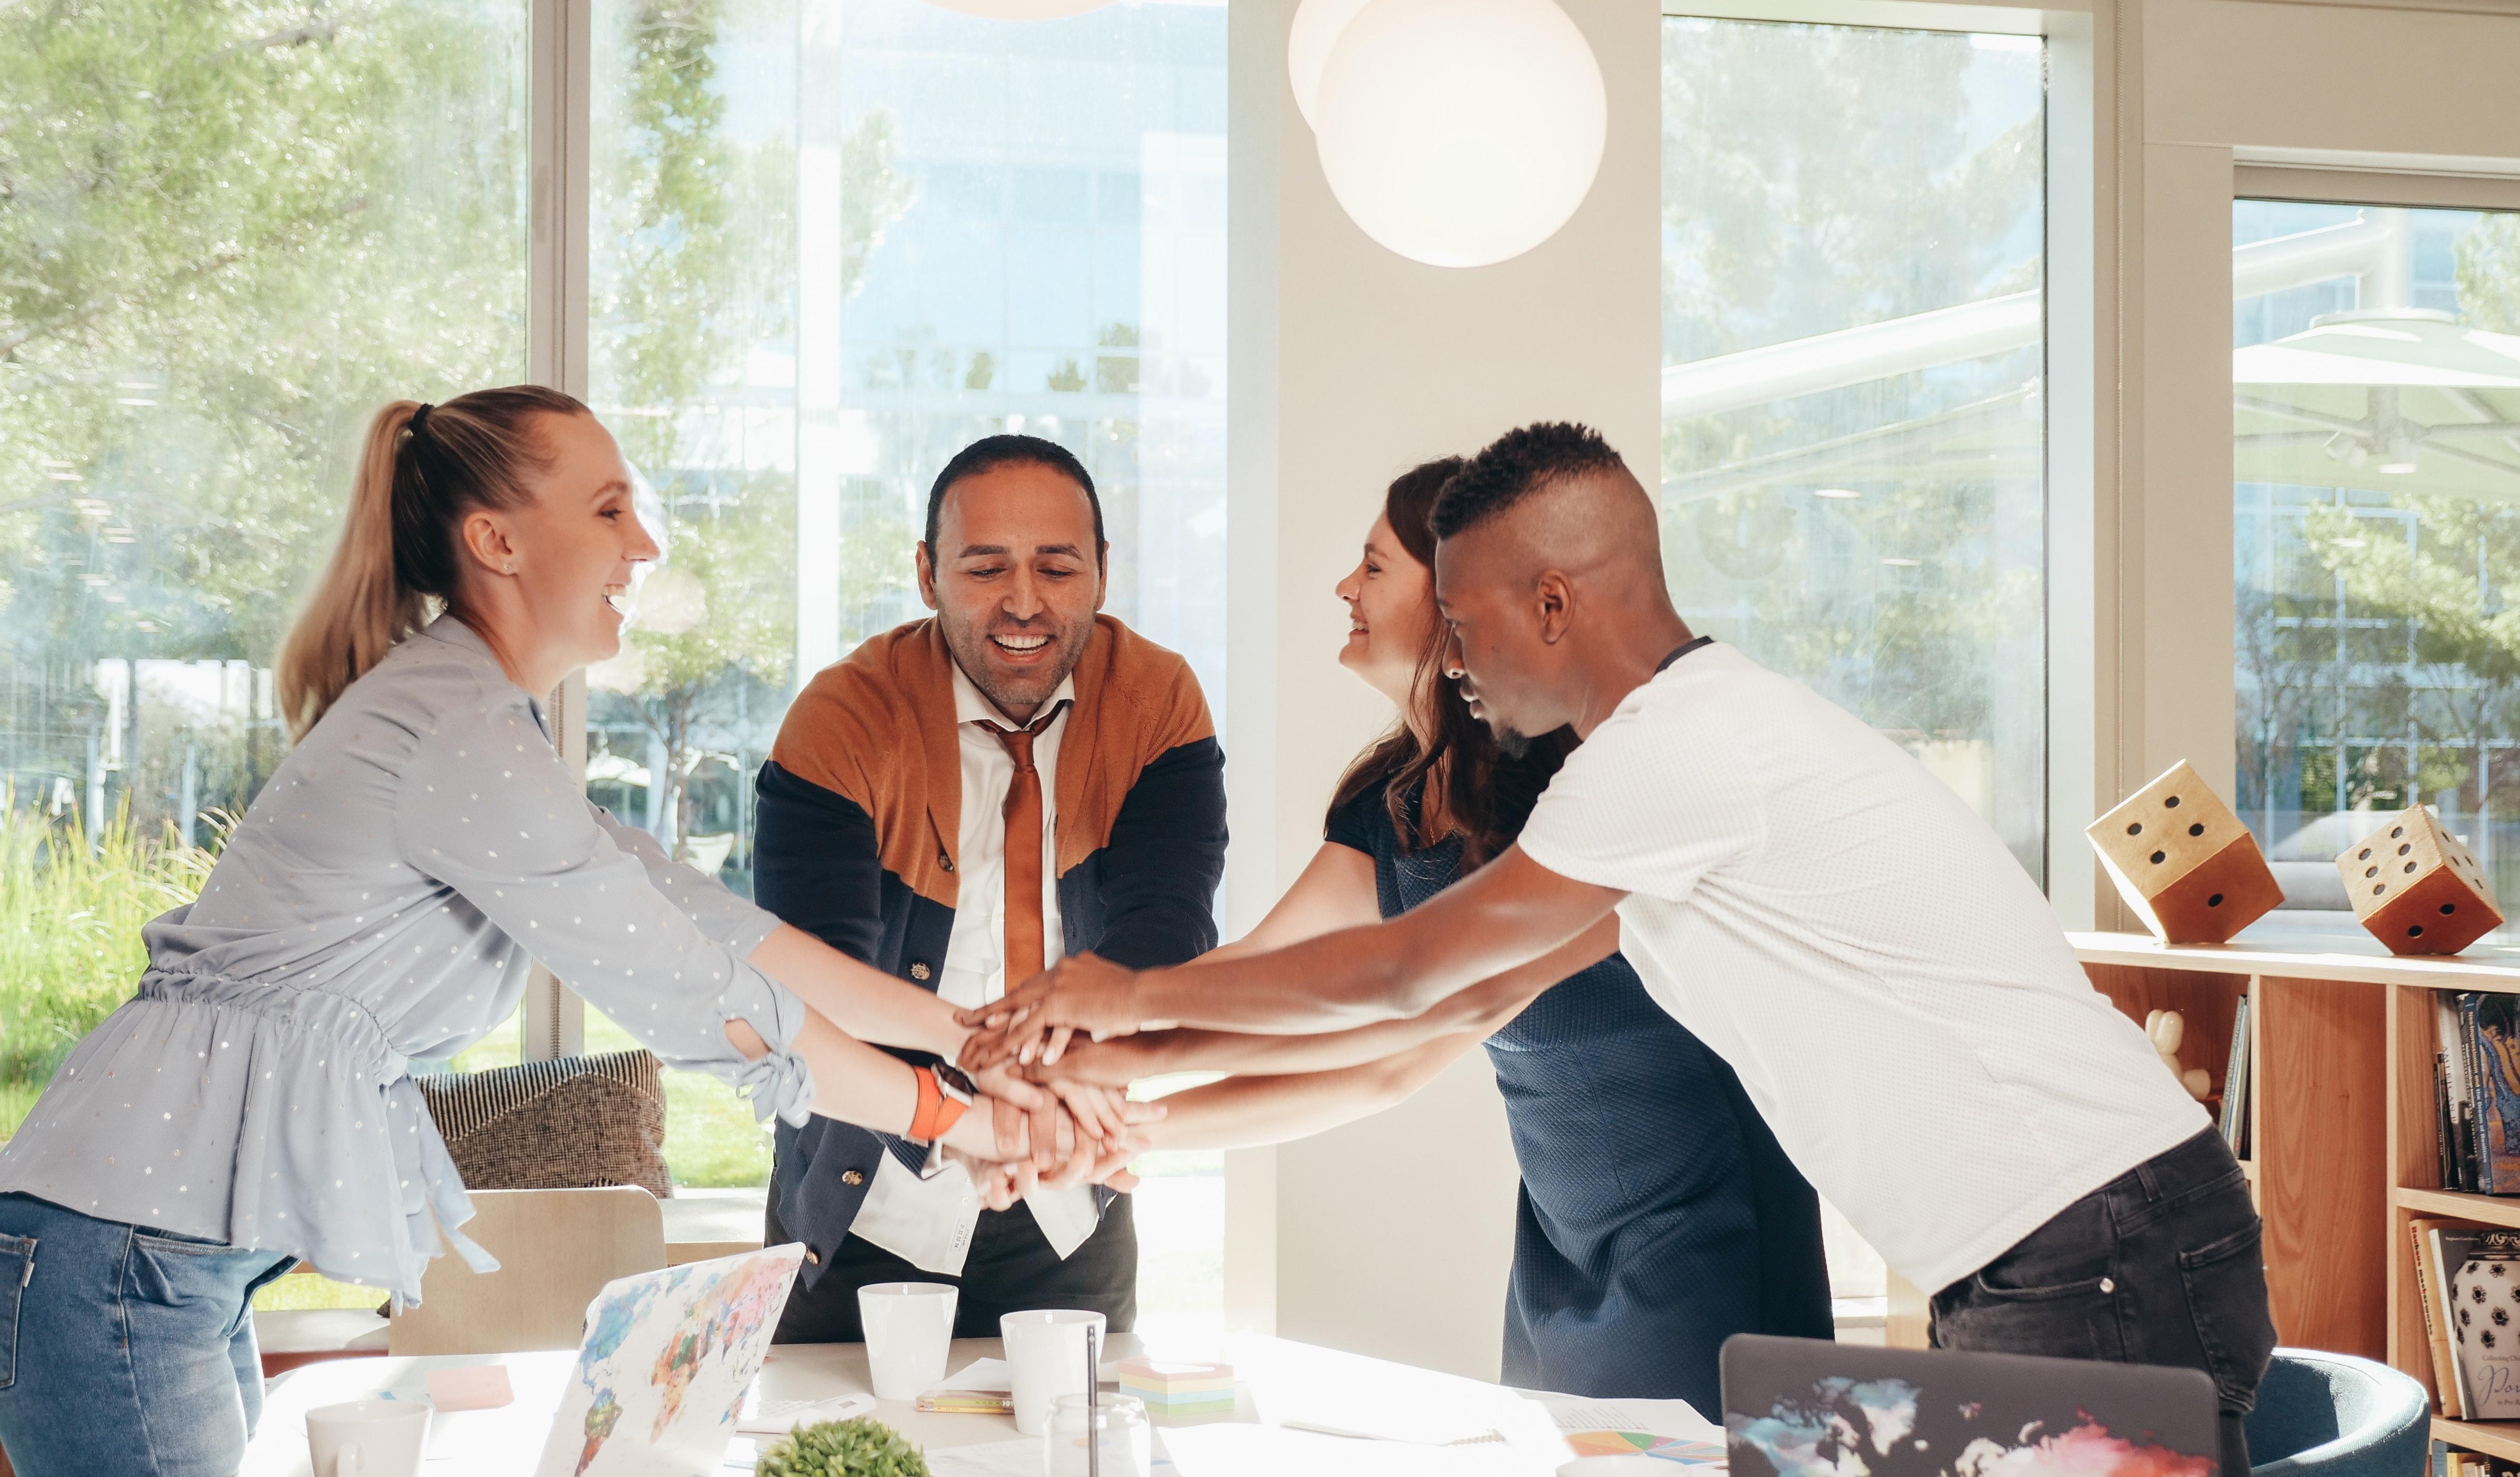 4 Types of People Every Organization Needs